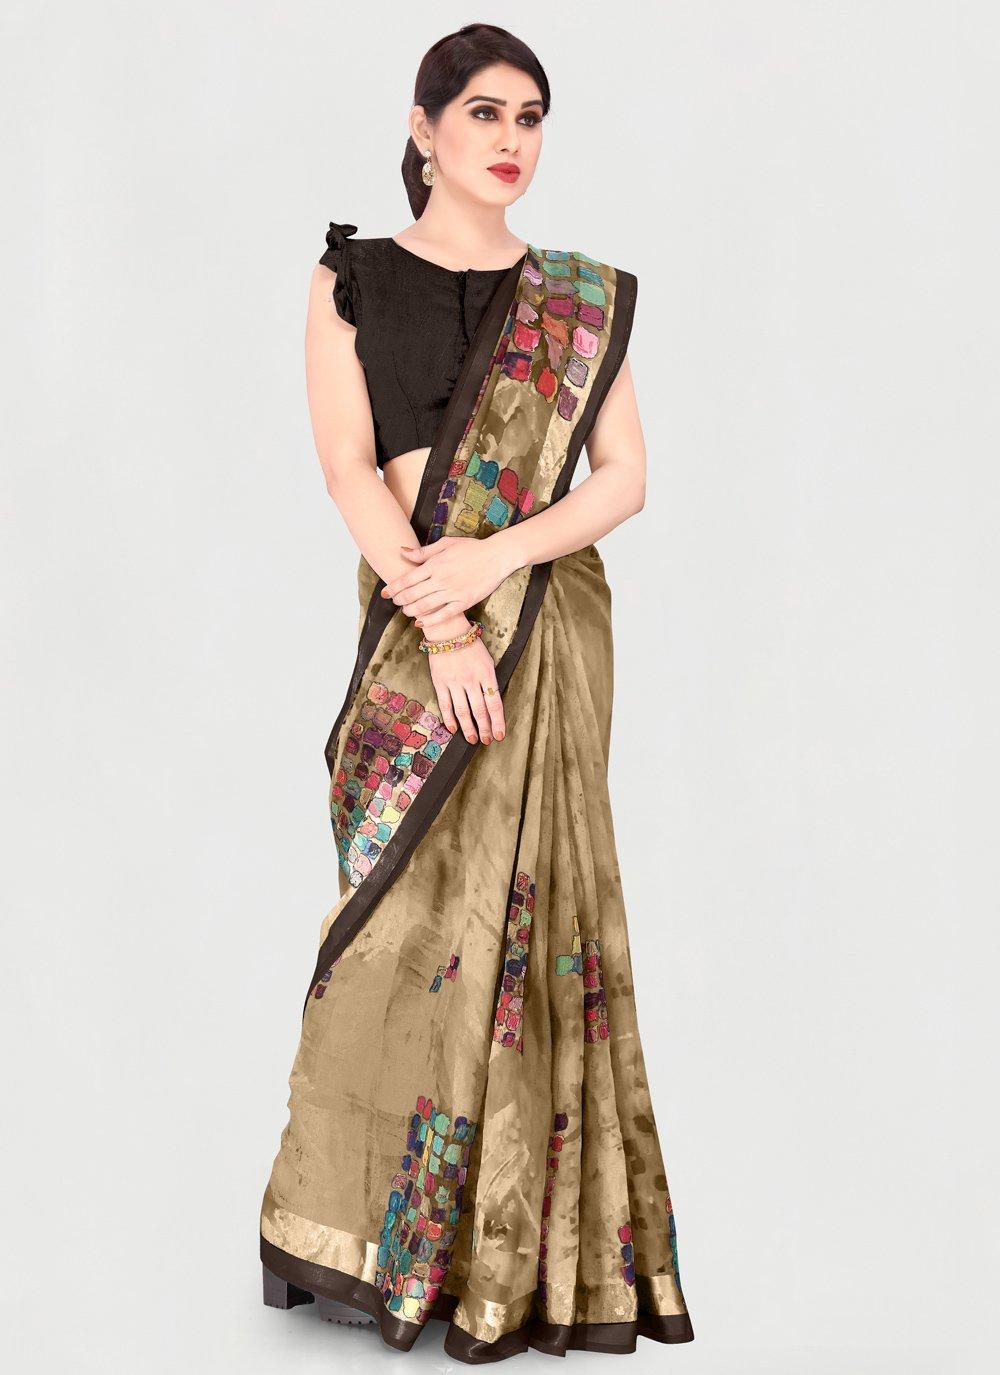 Cotton Printed Printed Saree in Beige